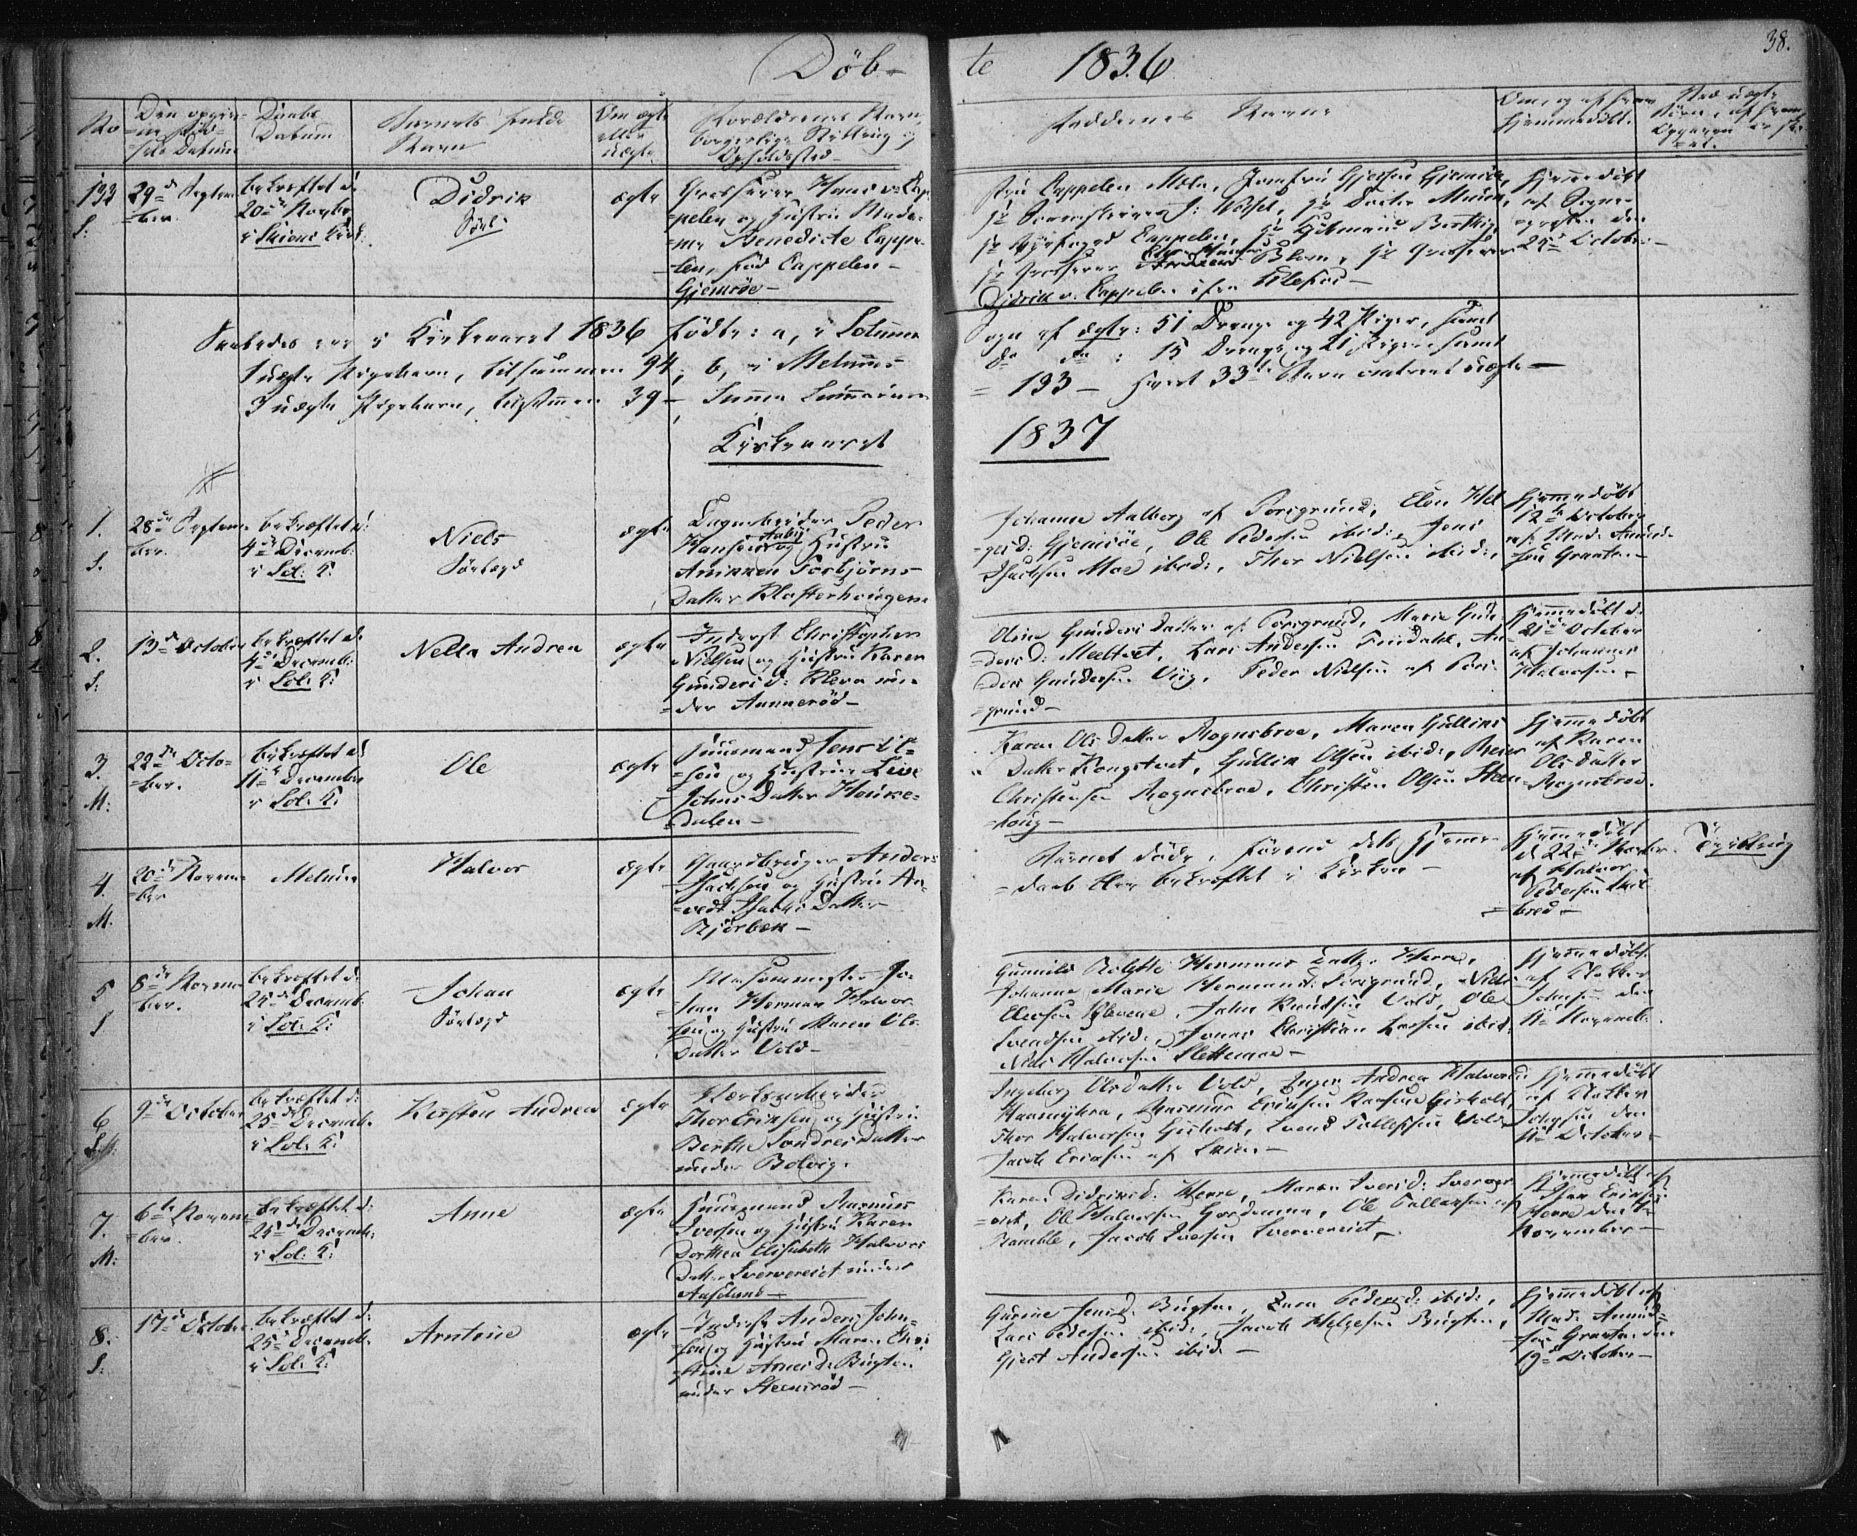 SAKO, Solum kirkebøker, F/Fa/L0005: Ministerialbok nr. I 5, 1833-1843, s. 38